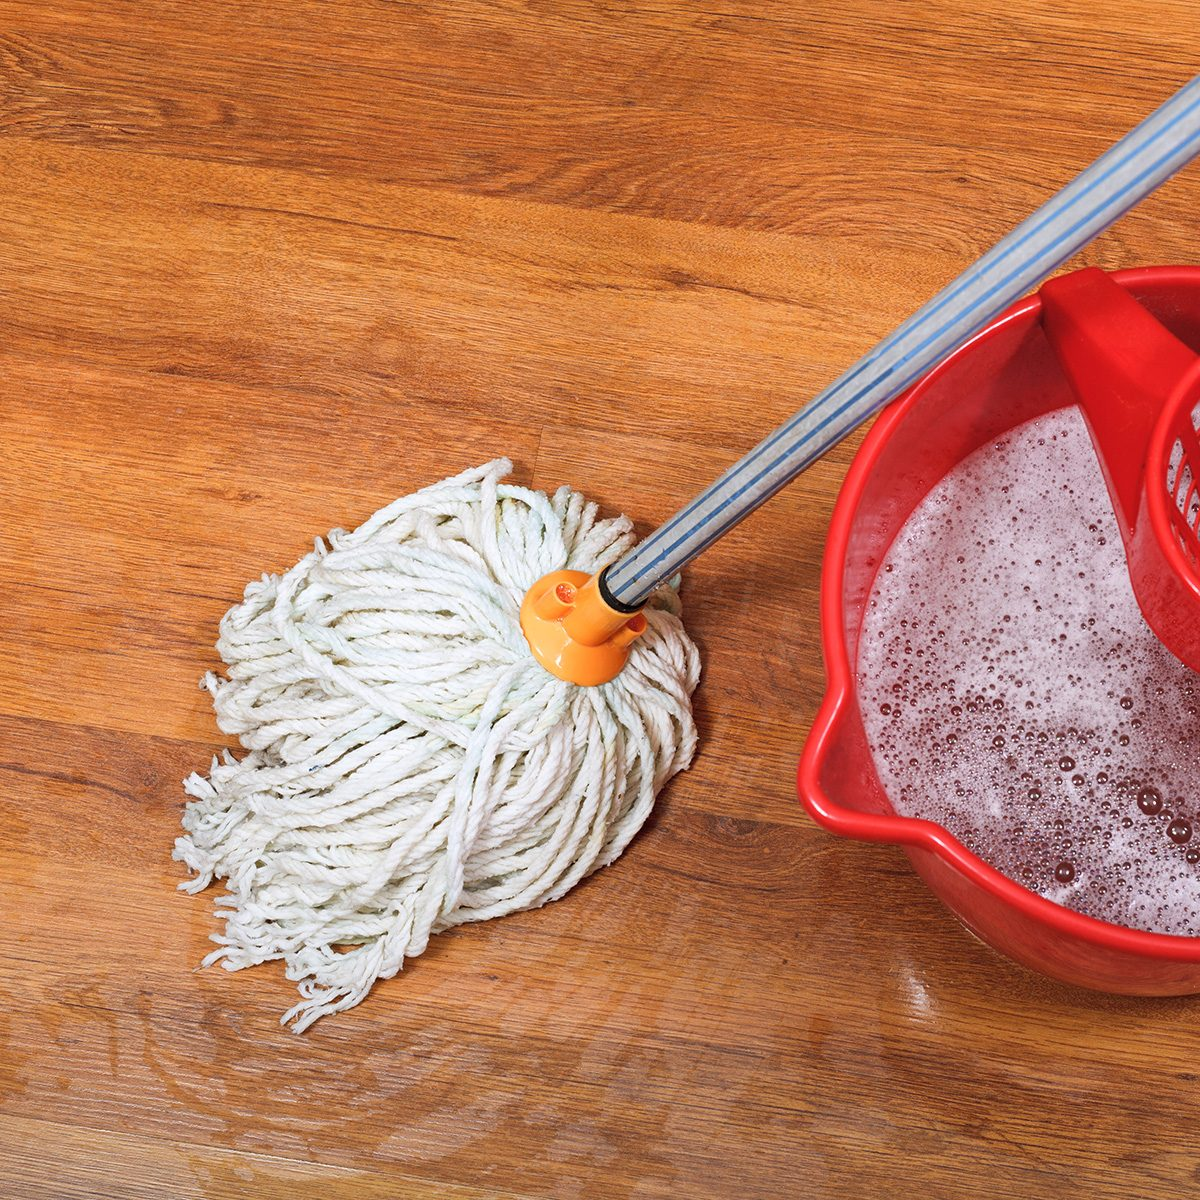 textile mop and red bucket on wooden wet floor